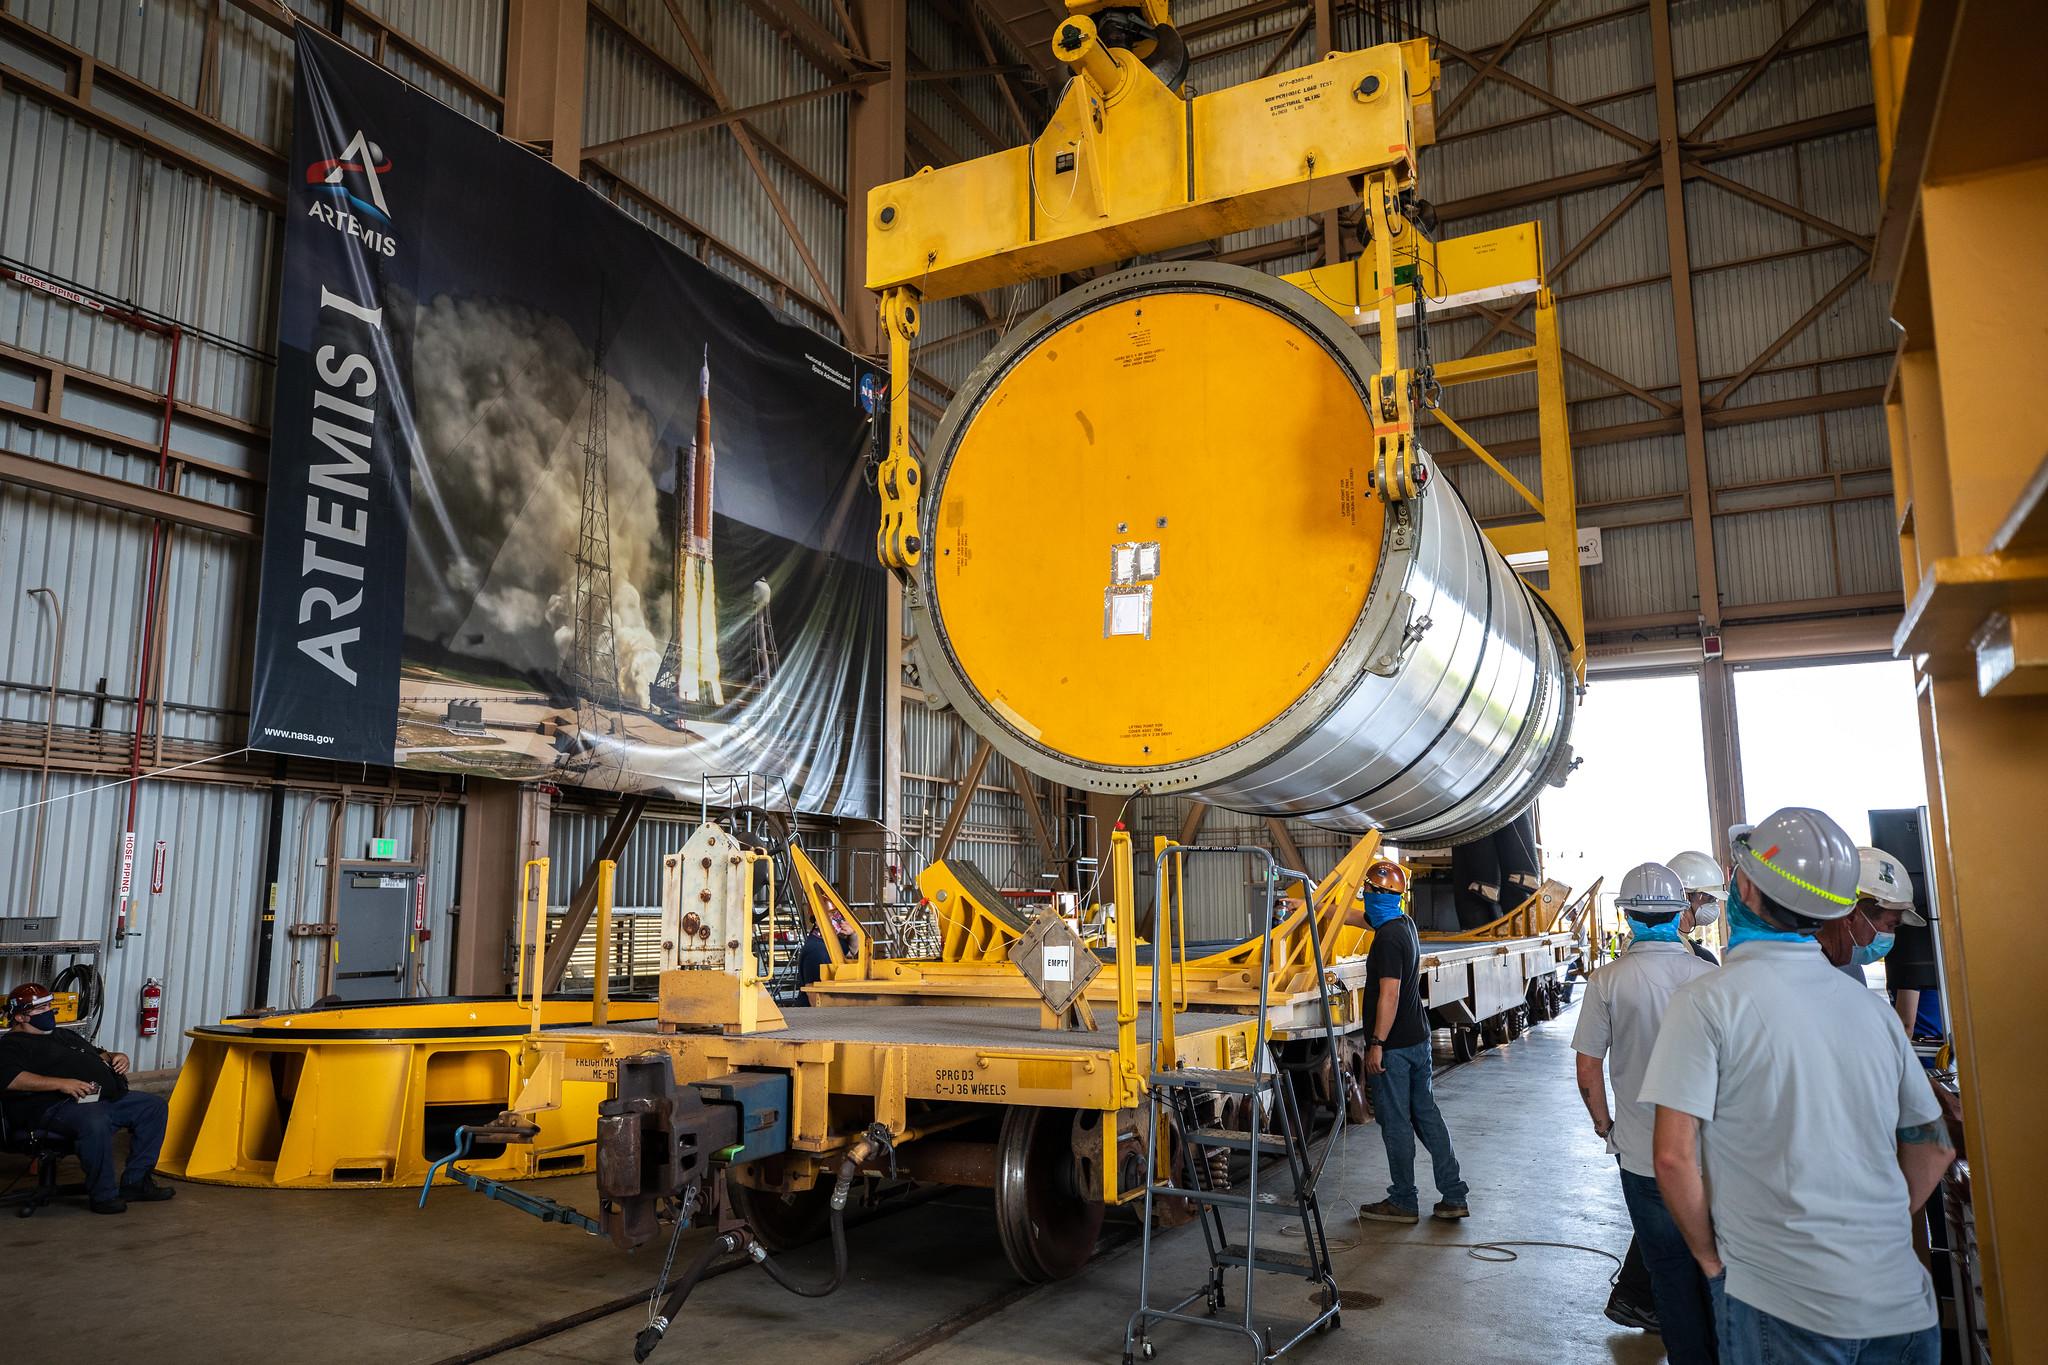 NASA, Northrop Grumman plan for 12 additional SLS Solid Rocket Boosters